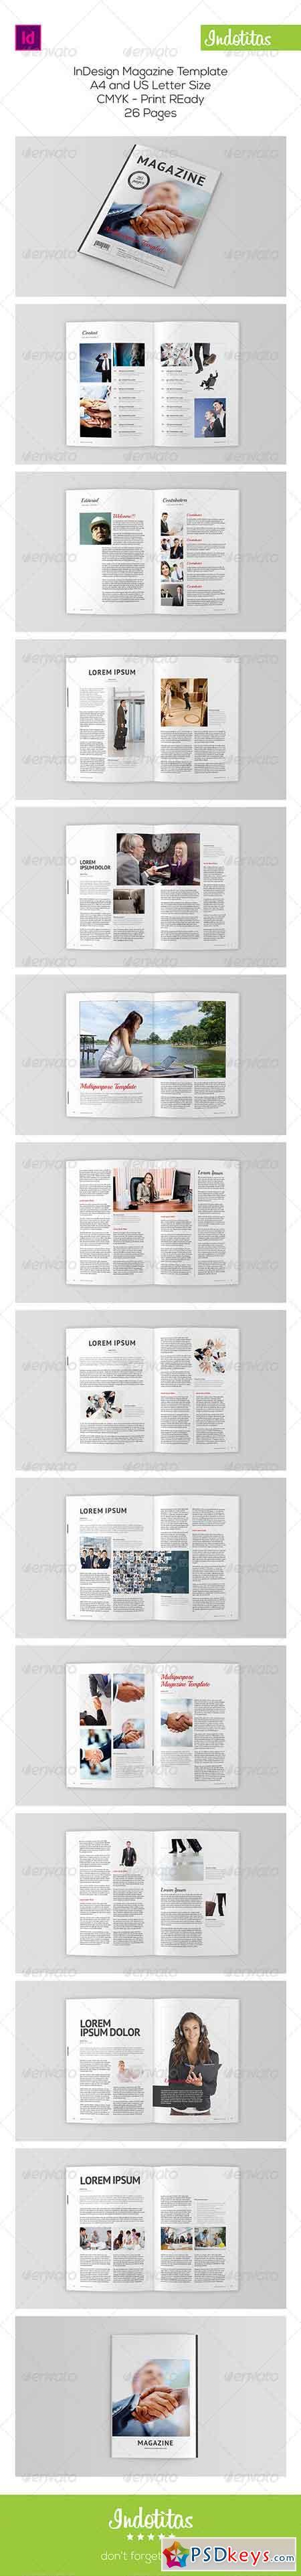 Indesign Magazine Template 8113351